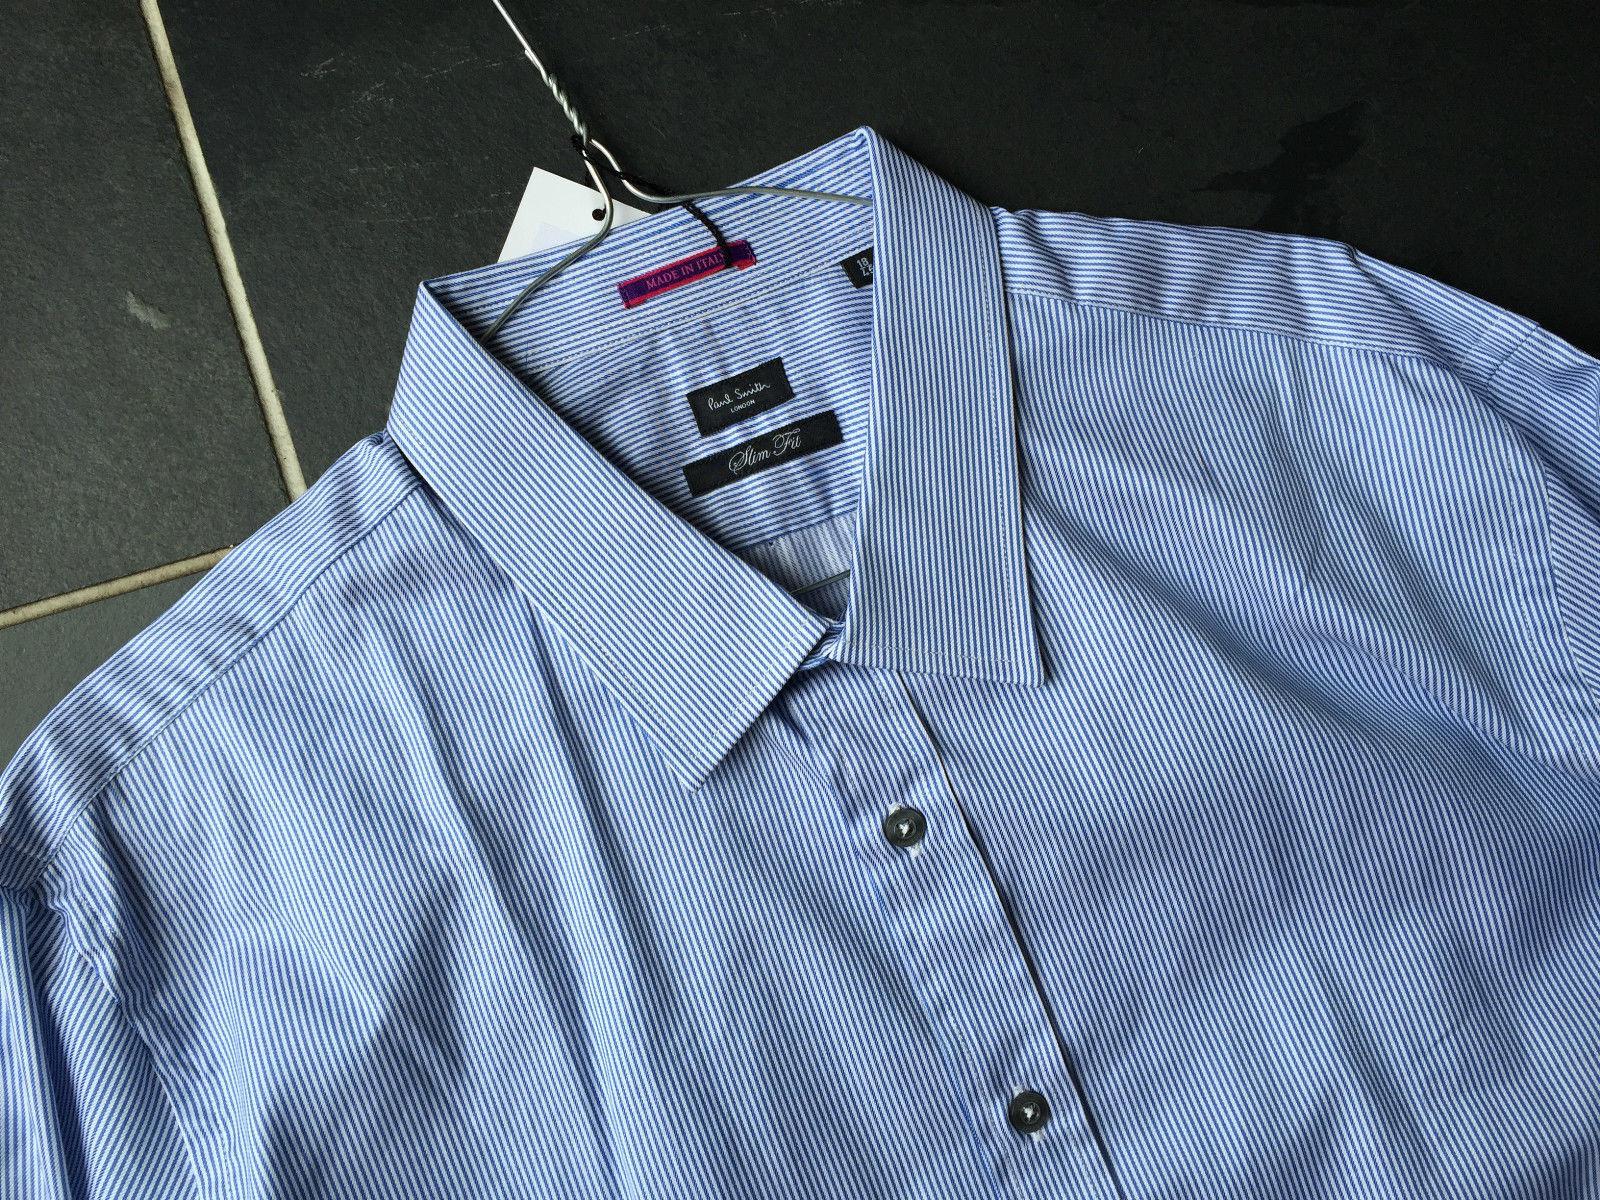 Paul Smith LONDON LS SLIM fit Shirt  Double Cuff - Size 18   45  - p2p 23